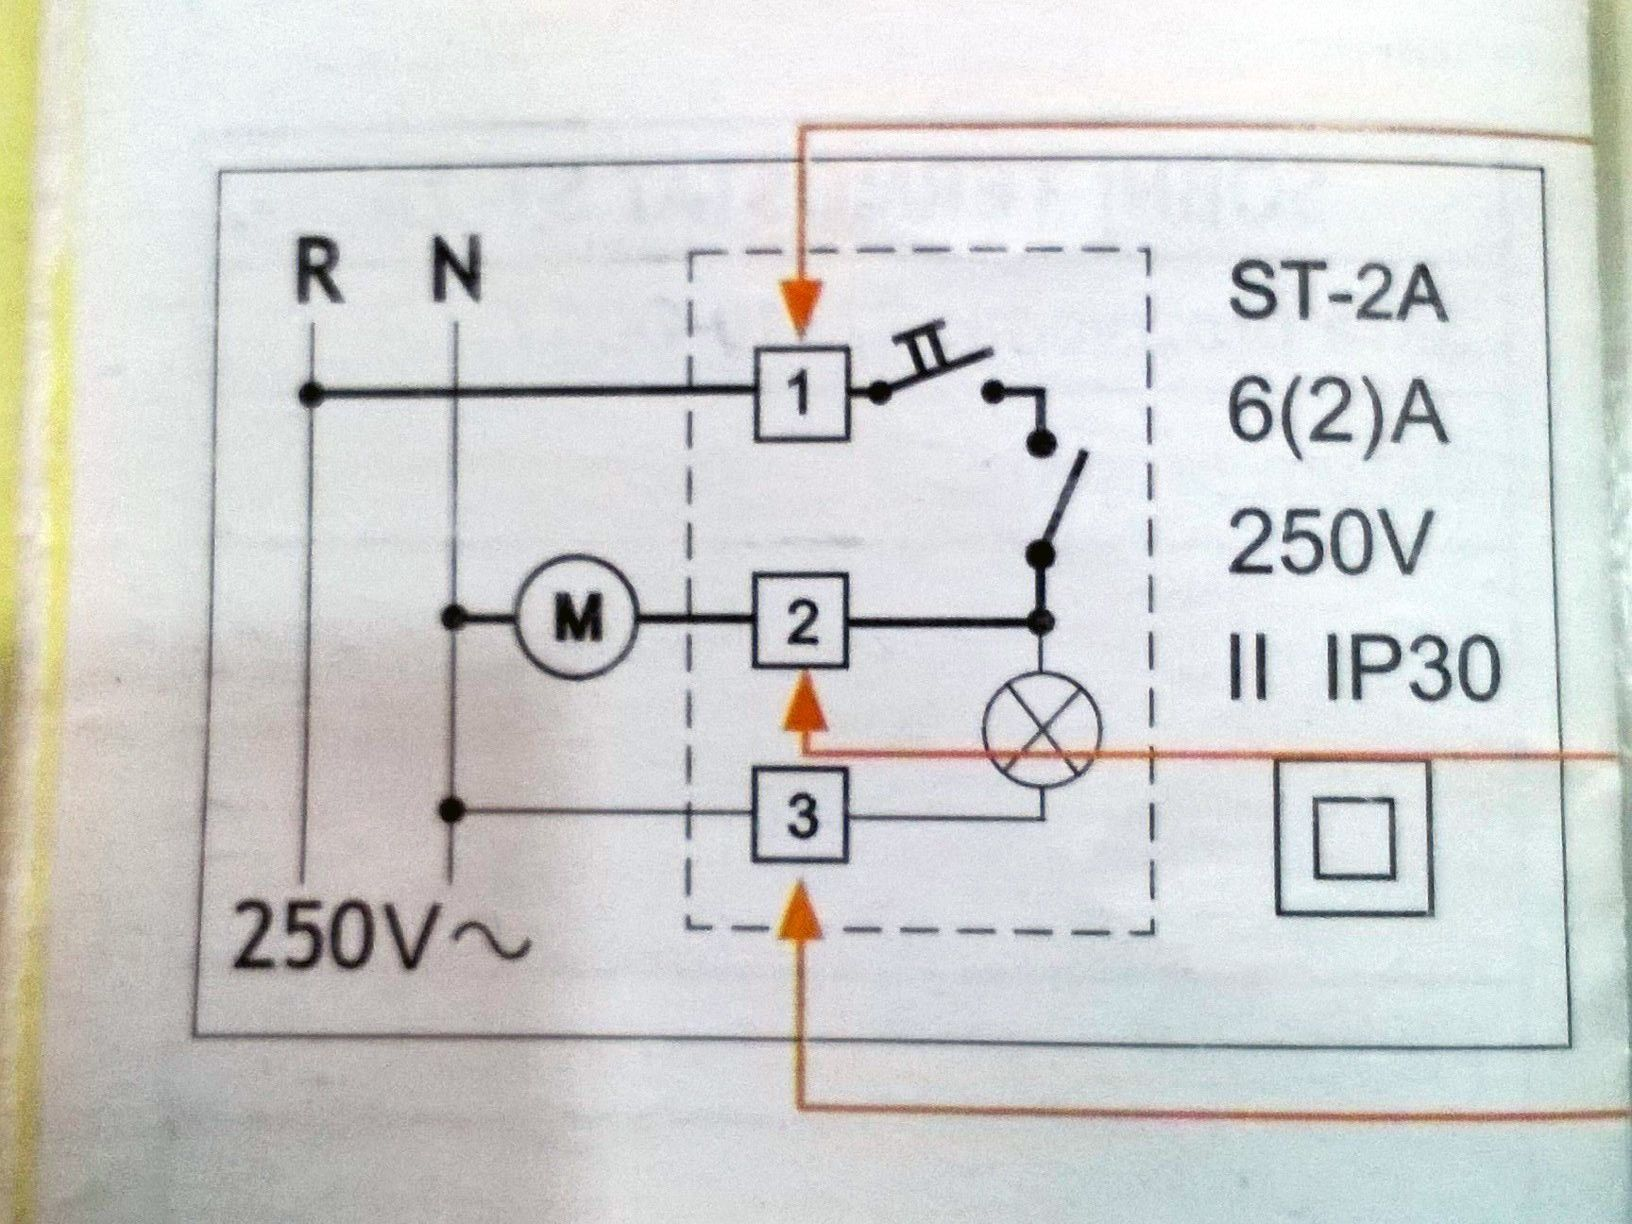 New Salus S Plan Wiring Diagram Diagrams Digramssample Diagramimages Wiringdiagramsample Wiringdiagram Diagram How To Plan Website